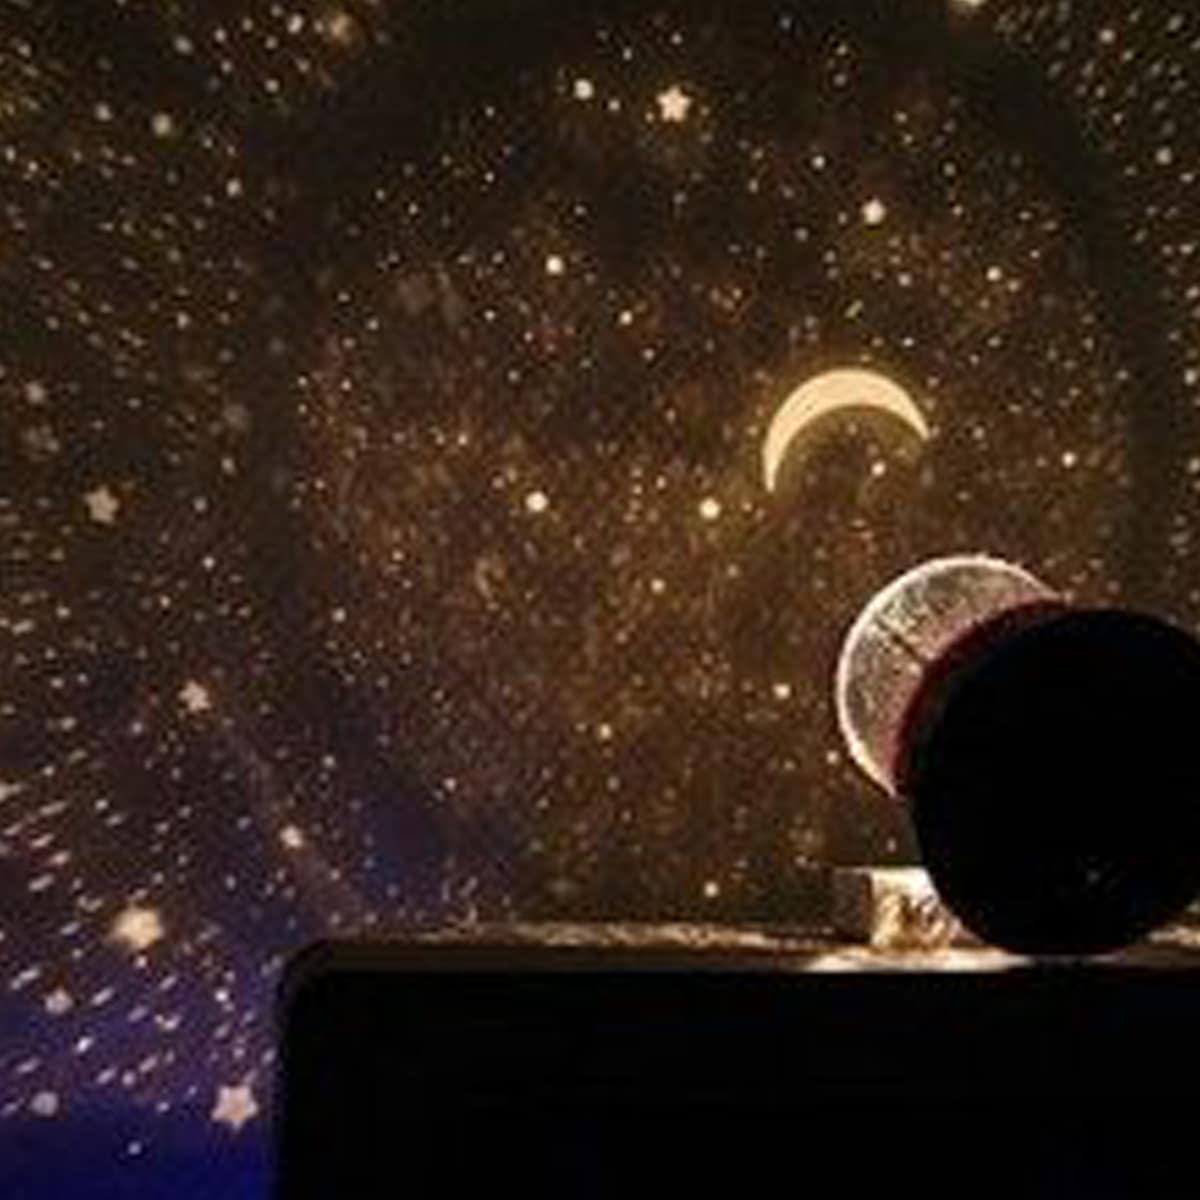 Star Master LED-projector nachtlampje